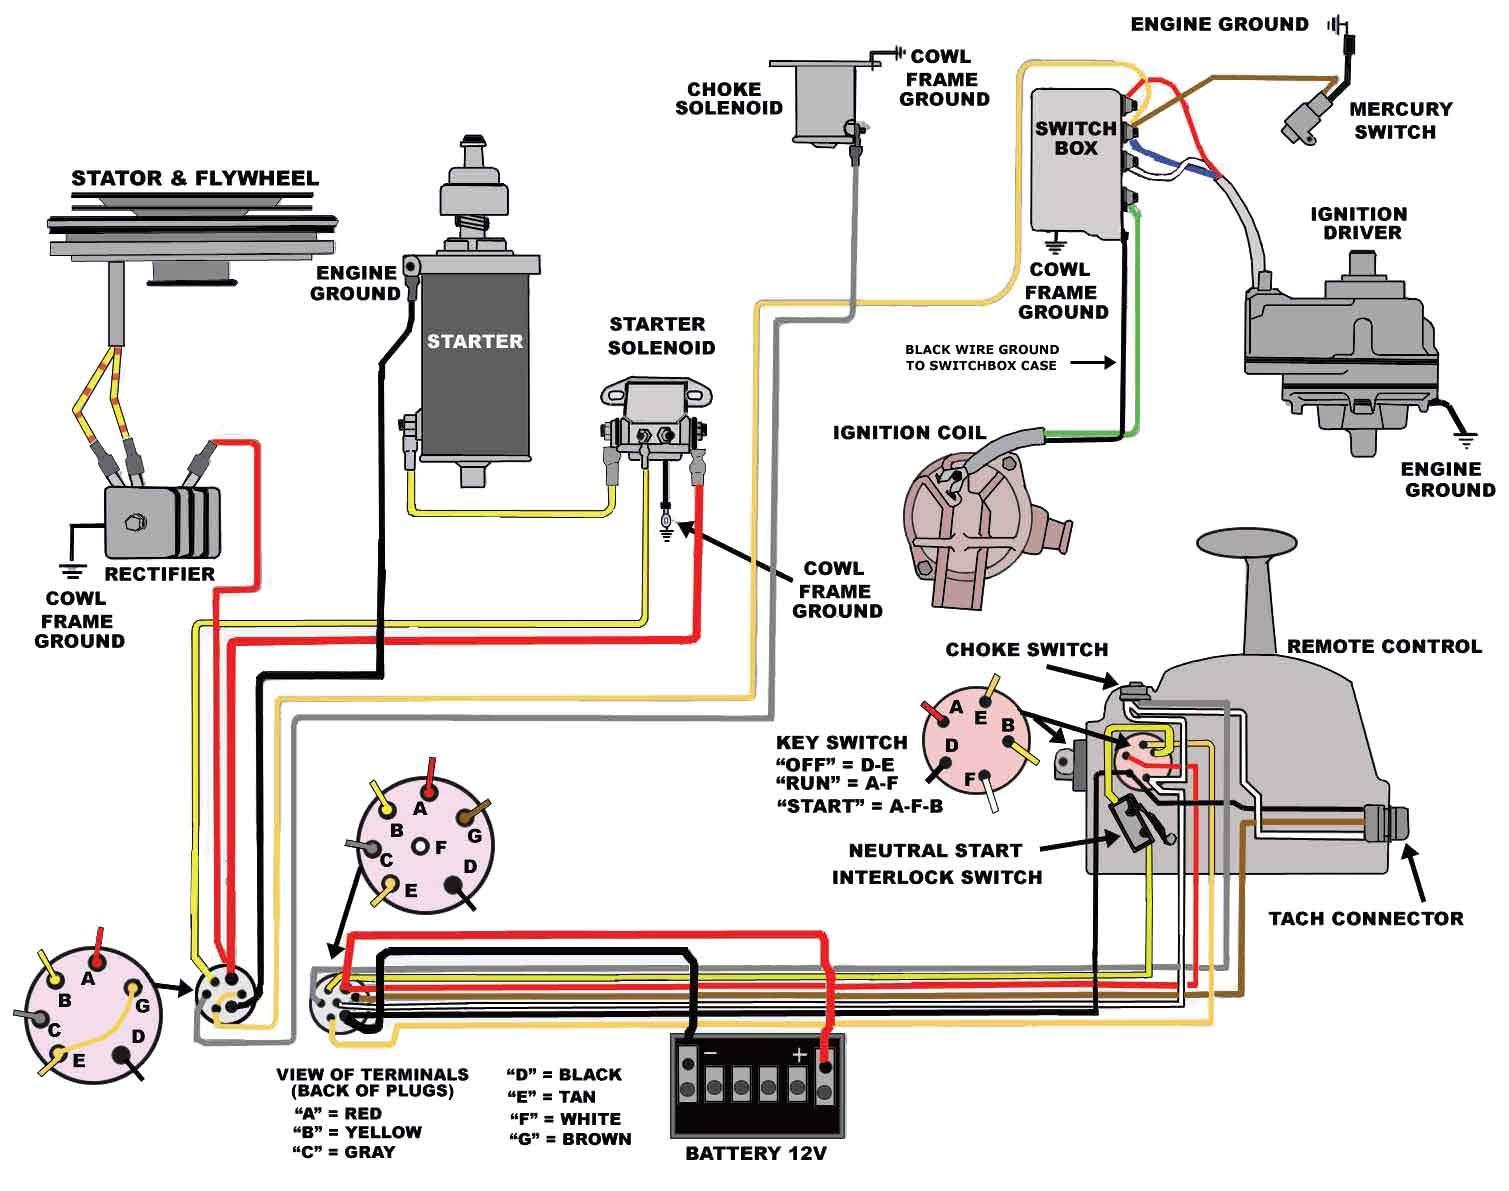 Suzuki Outboard Wiring Harness Wiring Diagram Corsa A Corsa A Pasticceriagele It